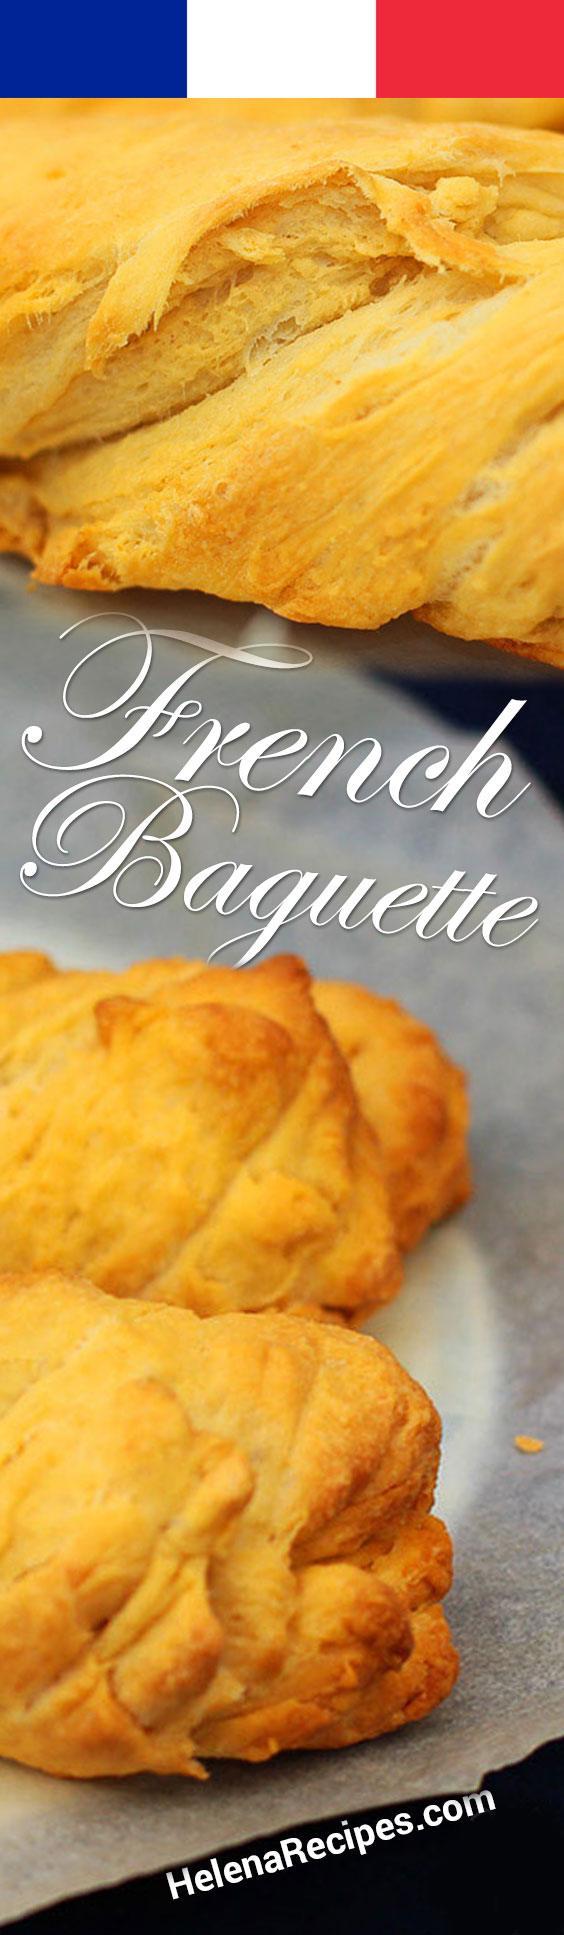 French Baguette Recipe Pinterest Image